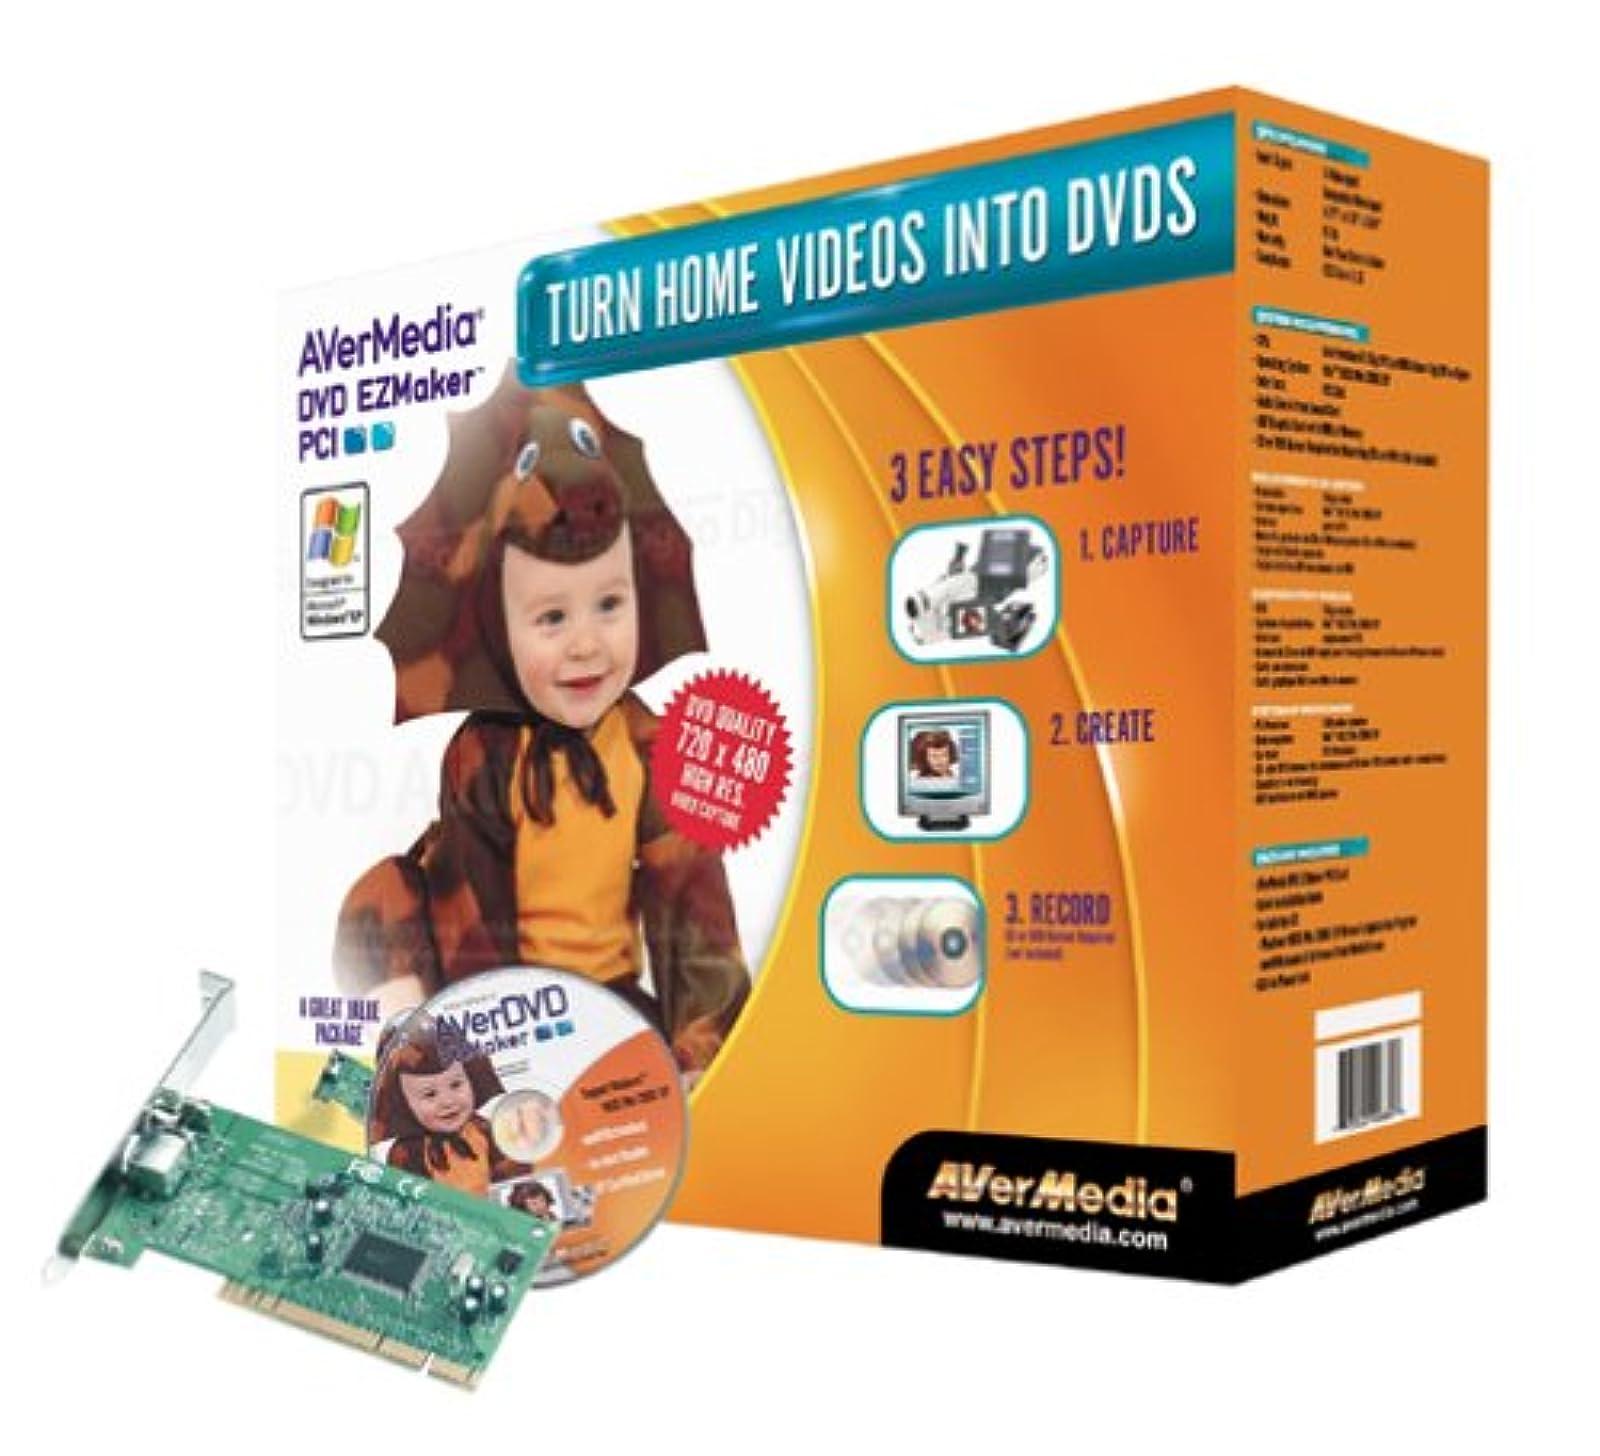 Avermedia Ezmaker DVD PCI Software Video KEE257